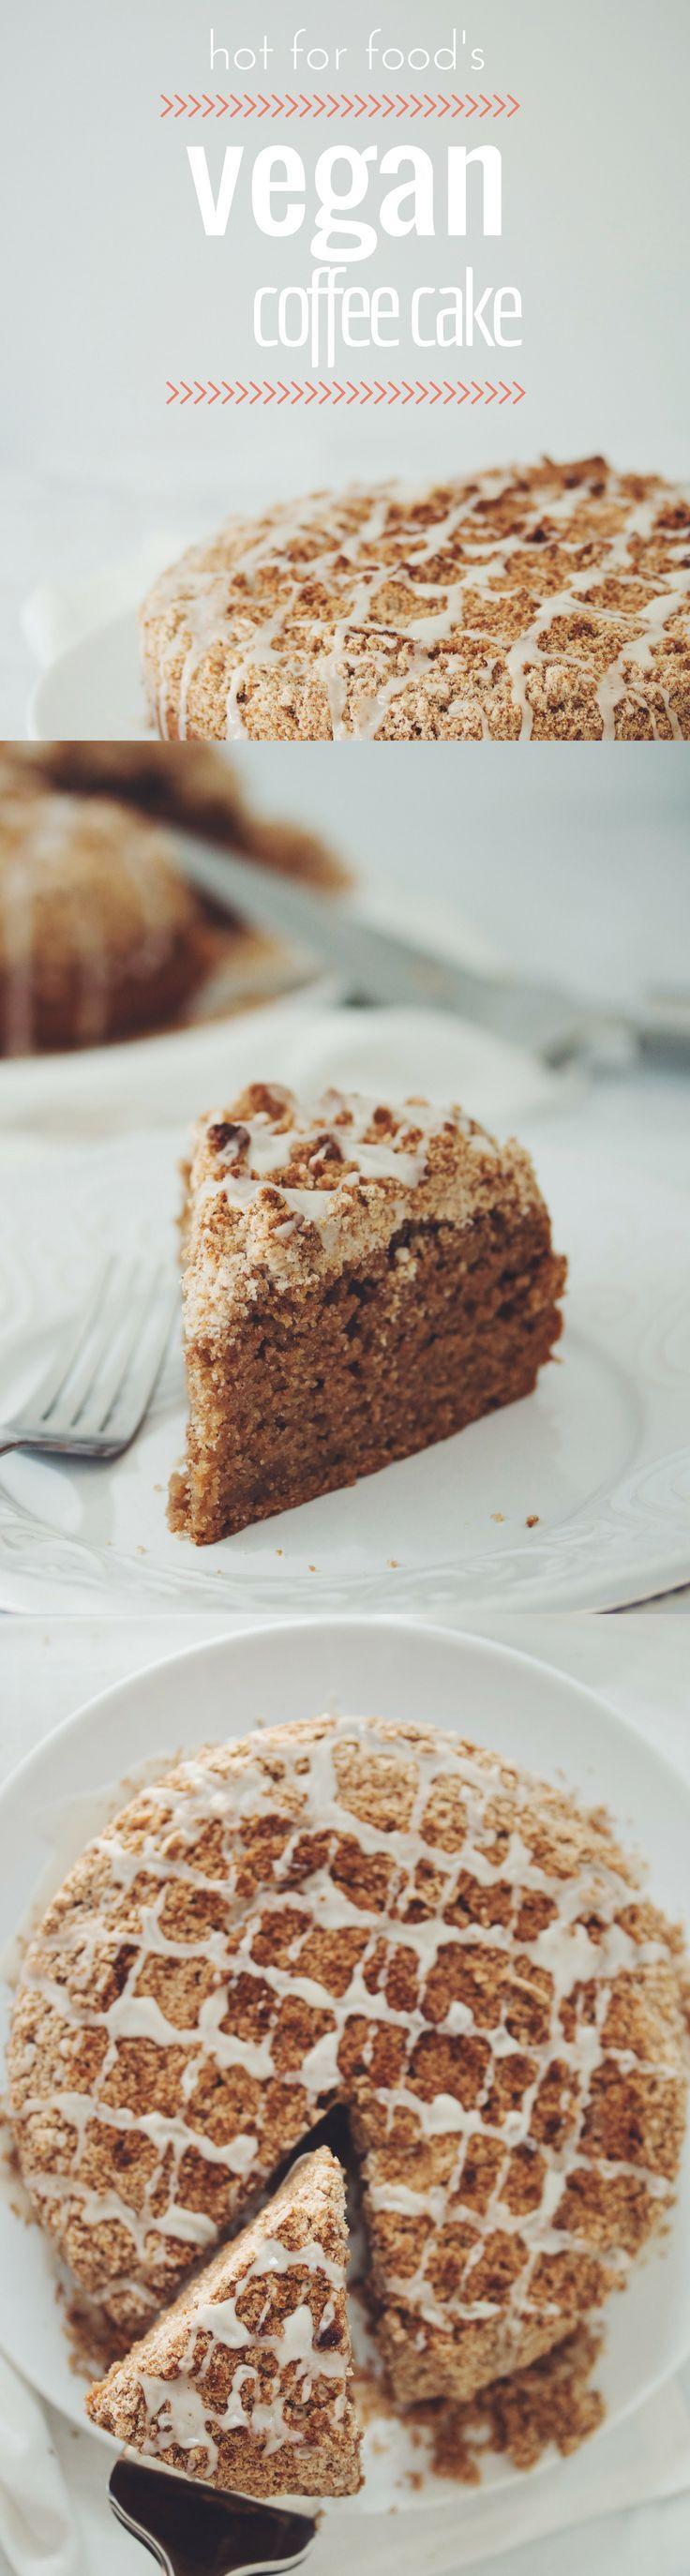 Vegan Coffee Recipes  Best 25 Vegan baking ideas on Pinterest